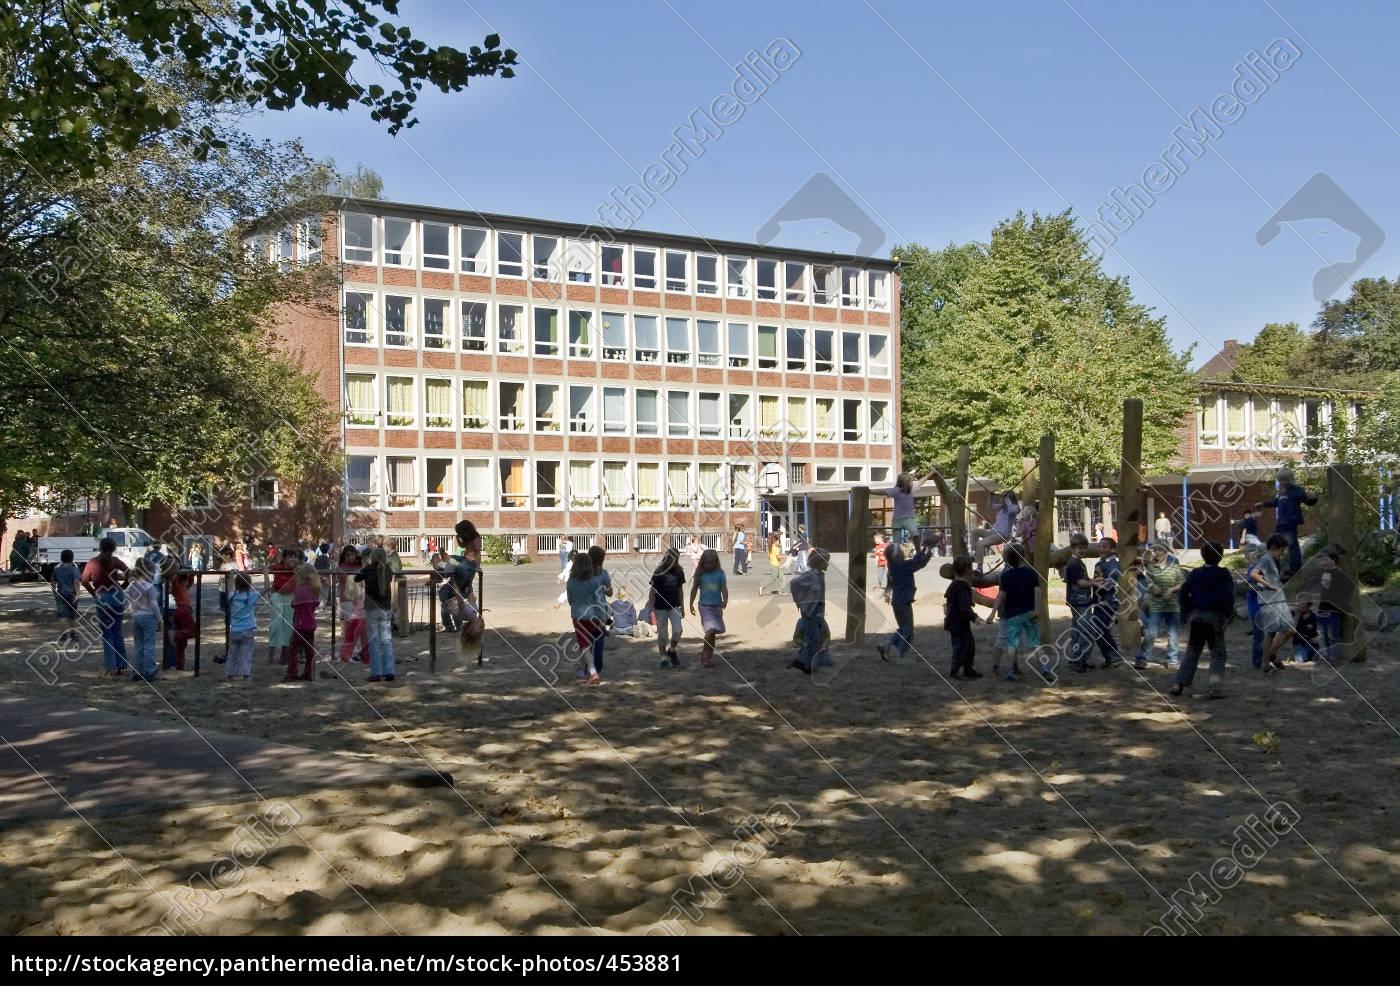 schoolyard - 453881